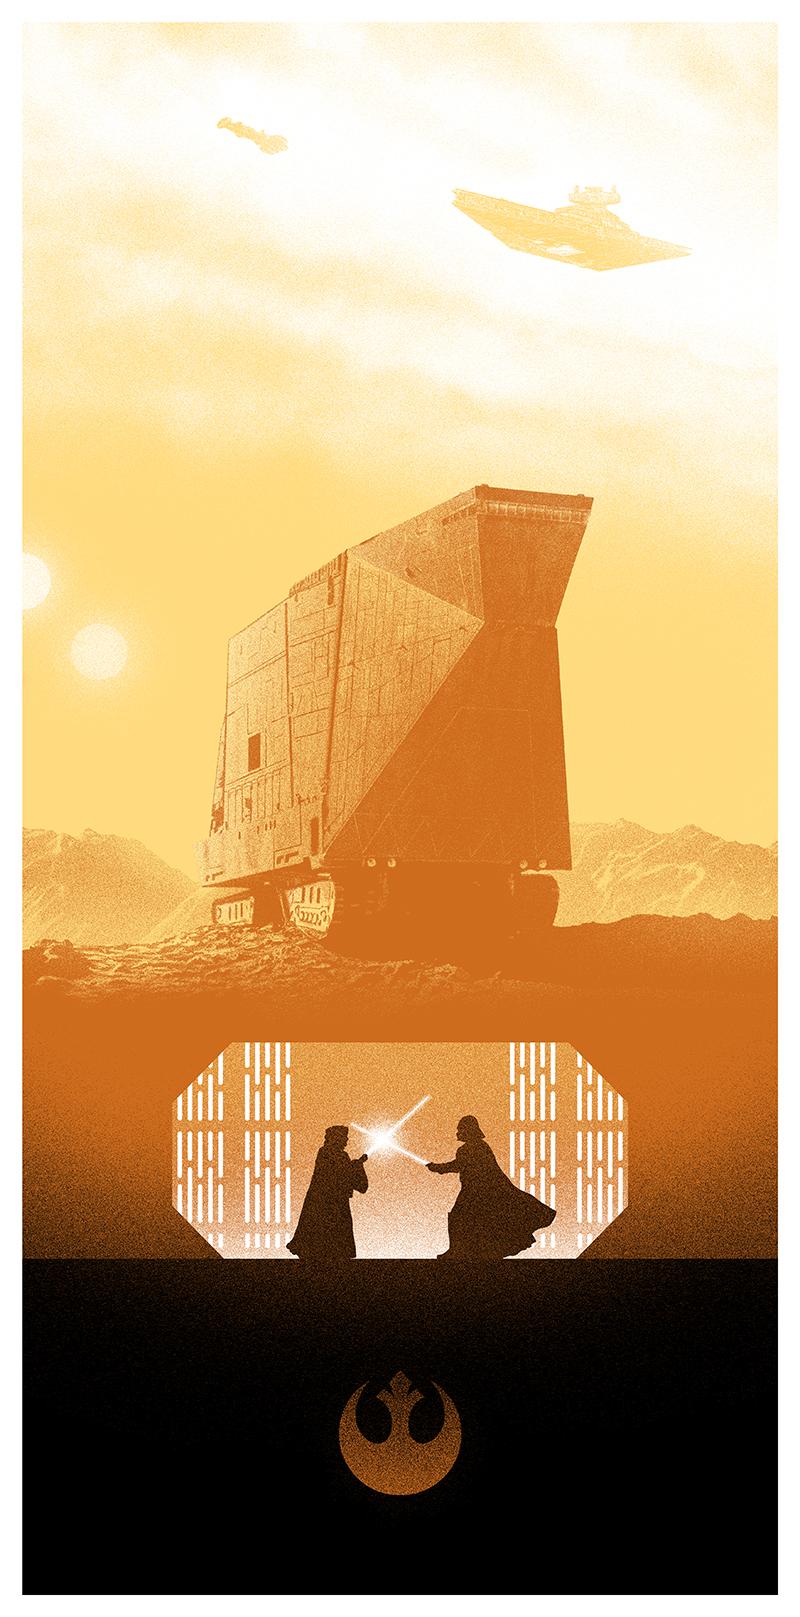 Star Wars Trilogy by Marko Manev